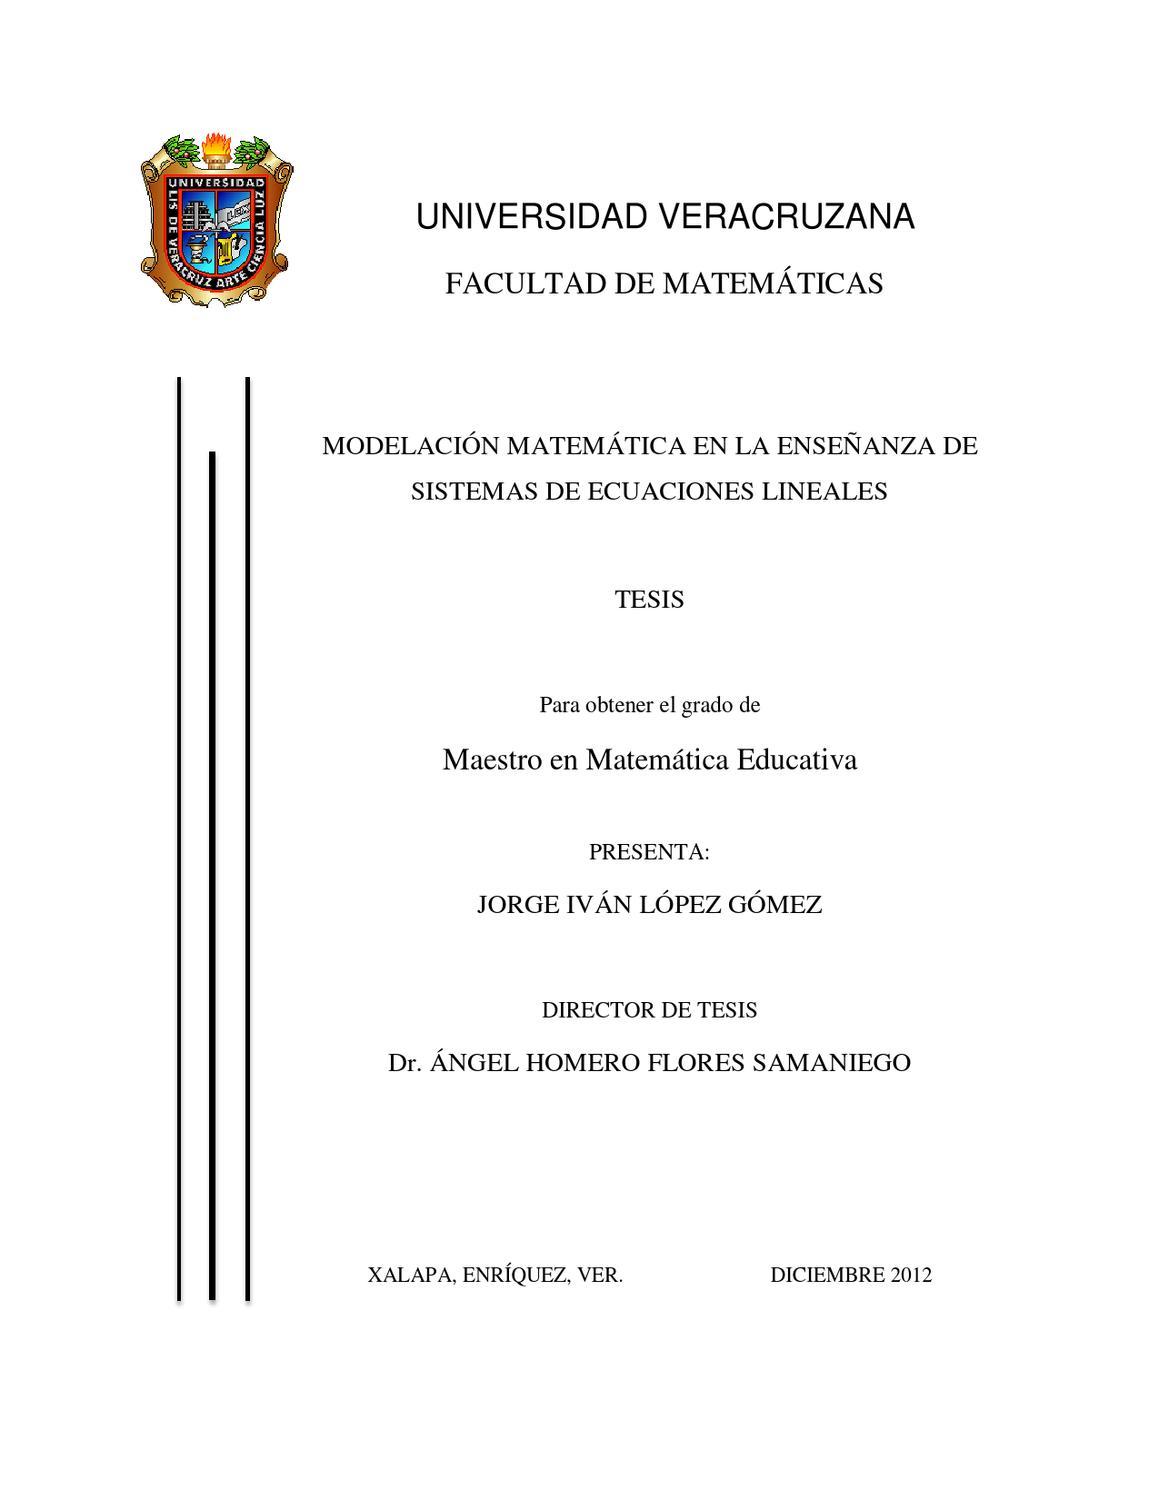 Tesis Modelación Matemática by Jorge Lopez - issuu